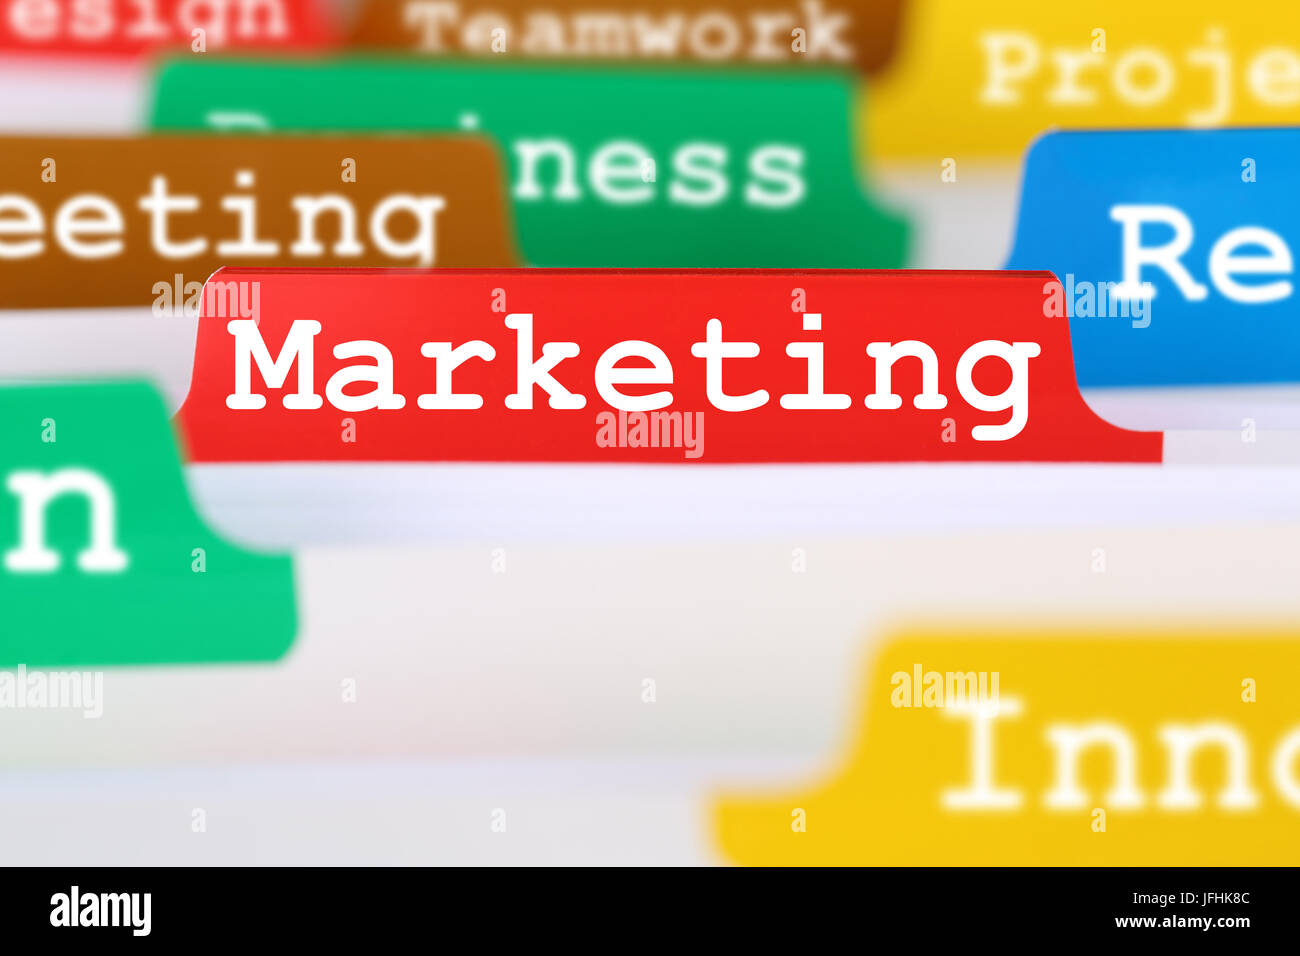 Comercialización oder Werbung für Firma im Büro Registrarse auf Business Dokumente Imagen De Stock